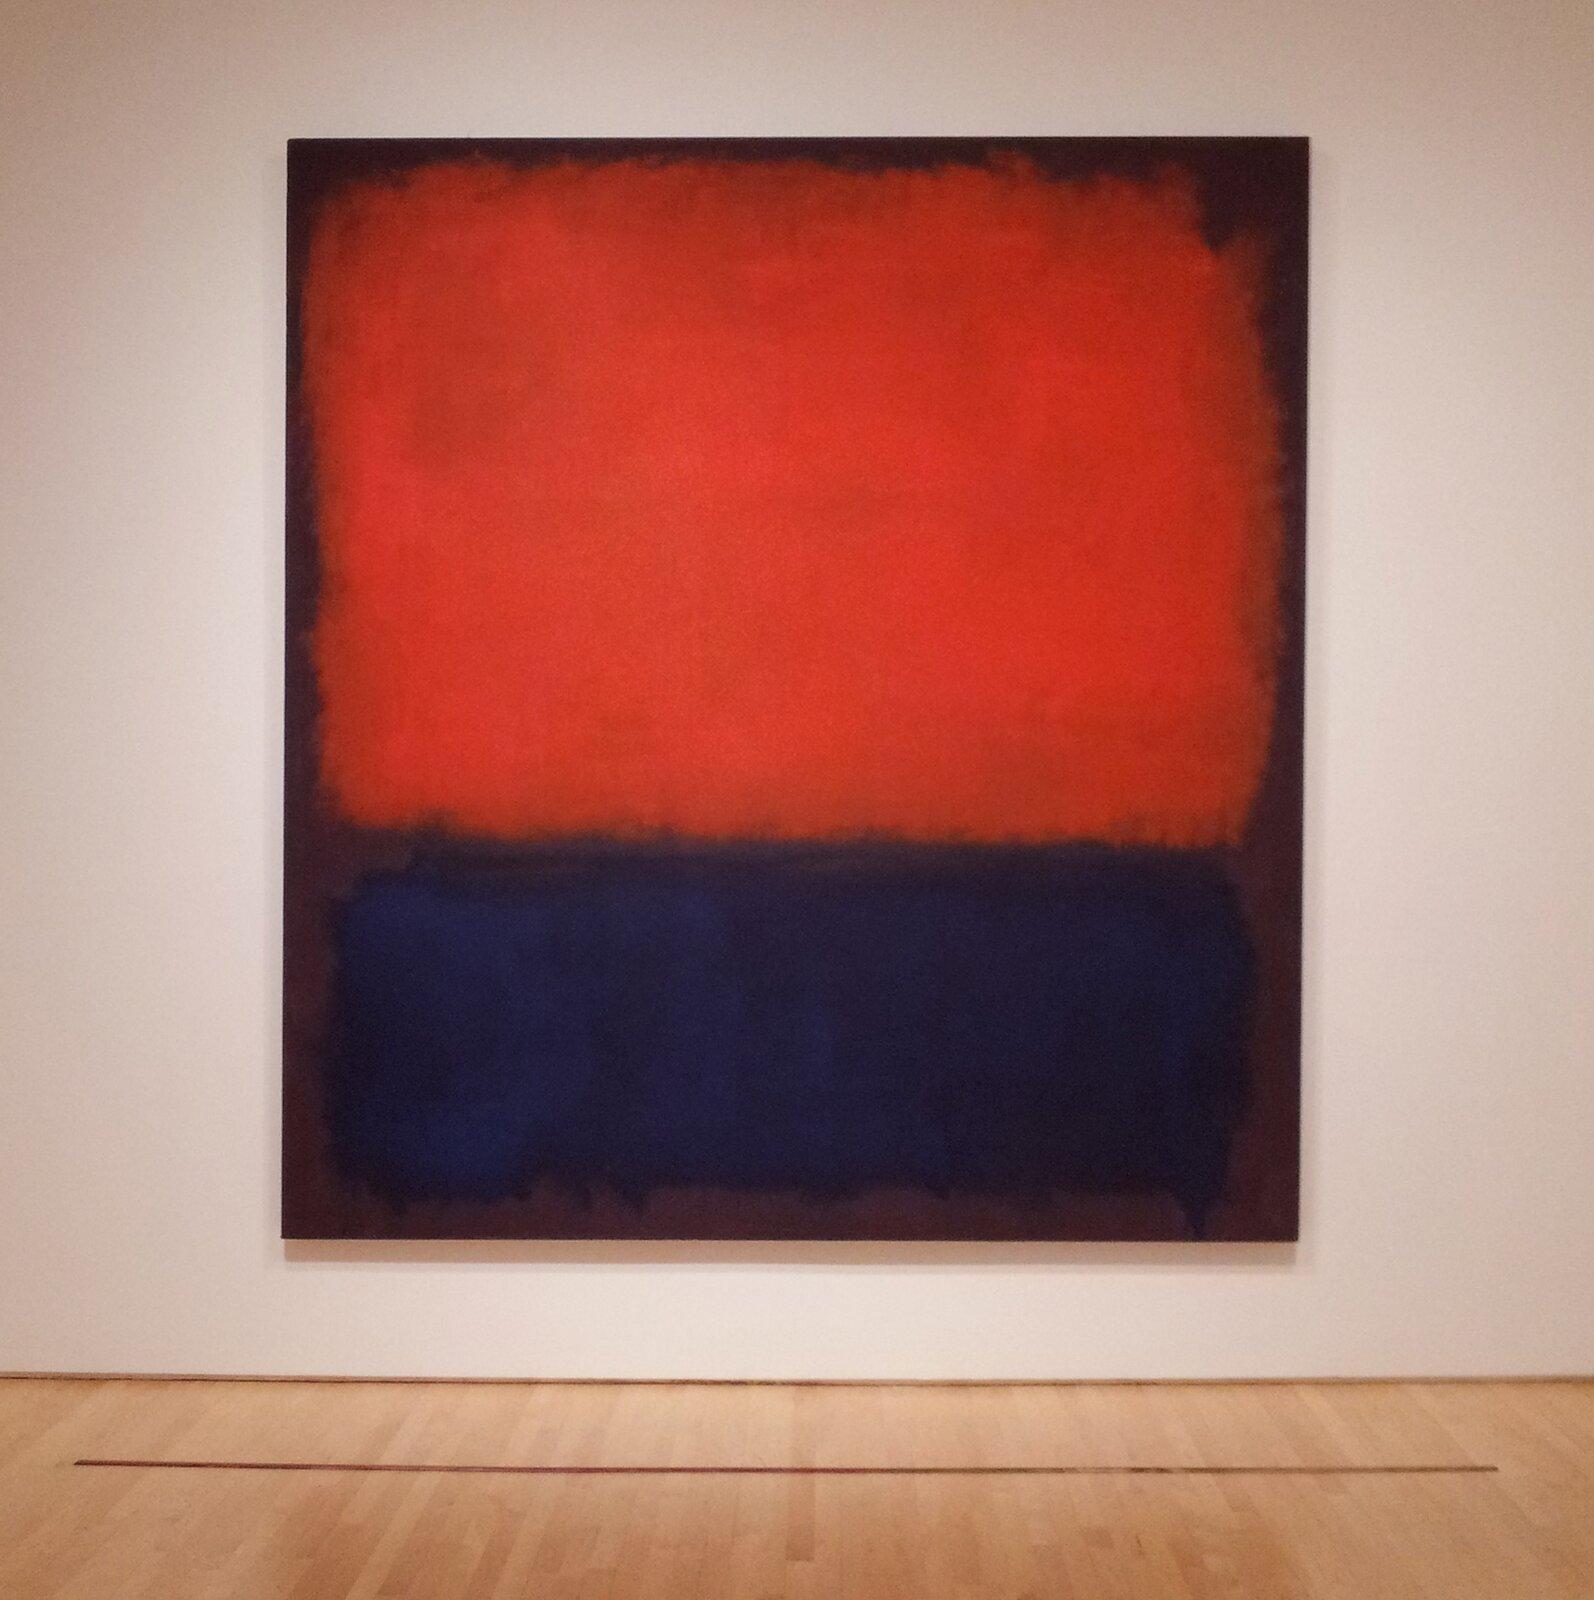 Number 14 291 x268 cm, , San Francisco Źródło: Mark Rothko, Number 14, 1960, olej na płótnie, Museum of Modern Art, San Francisco, licencja: CC 0.